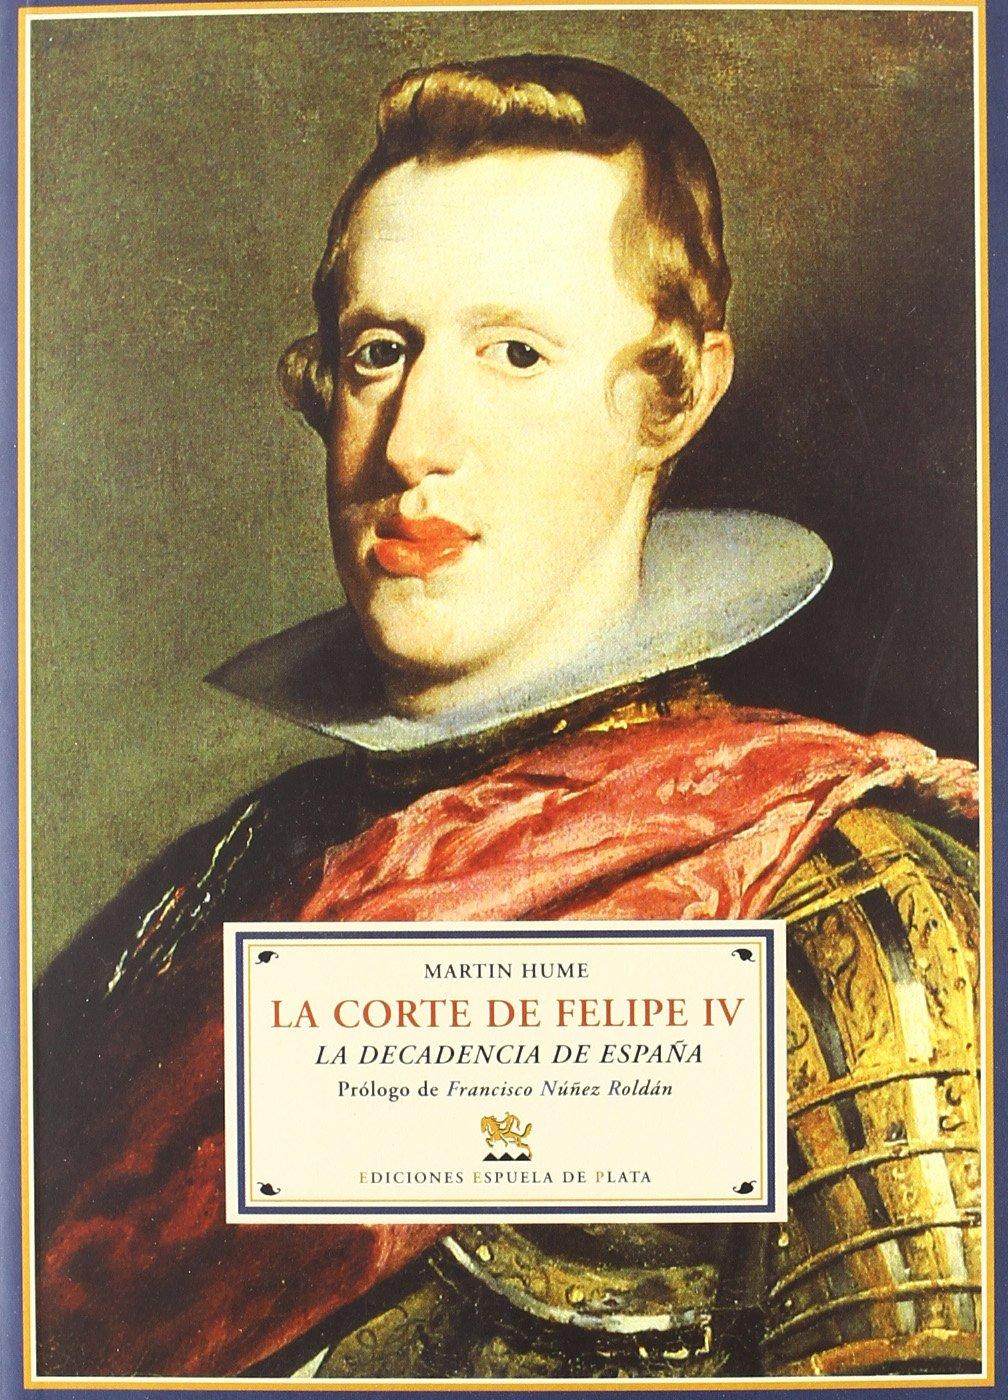 Corte De Felipe Iv,La (Biblioteca de Historia): Amazon.es: Hume, Martin, Núñez Roldan, Francisco: Libros